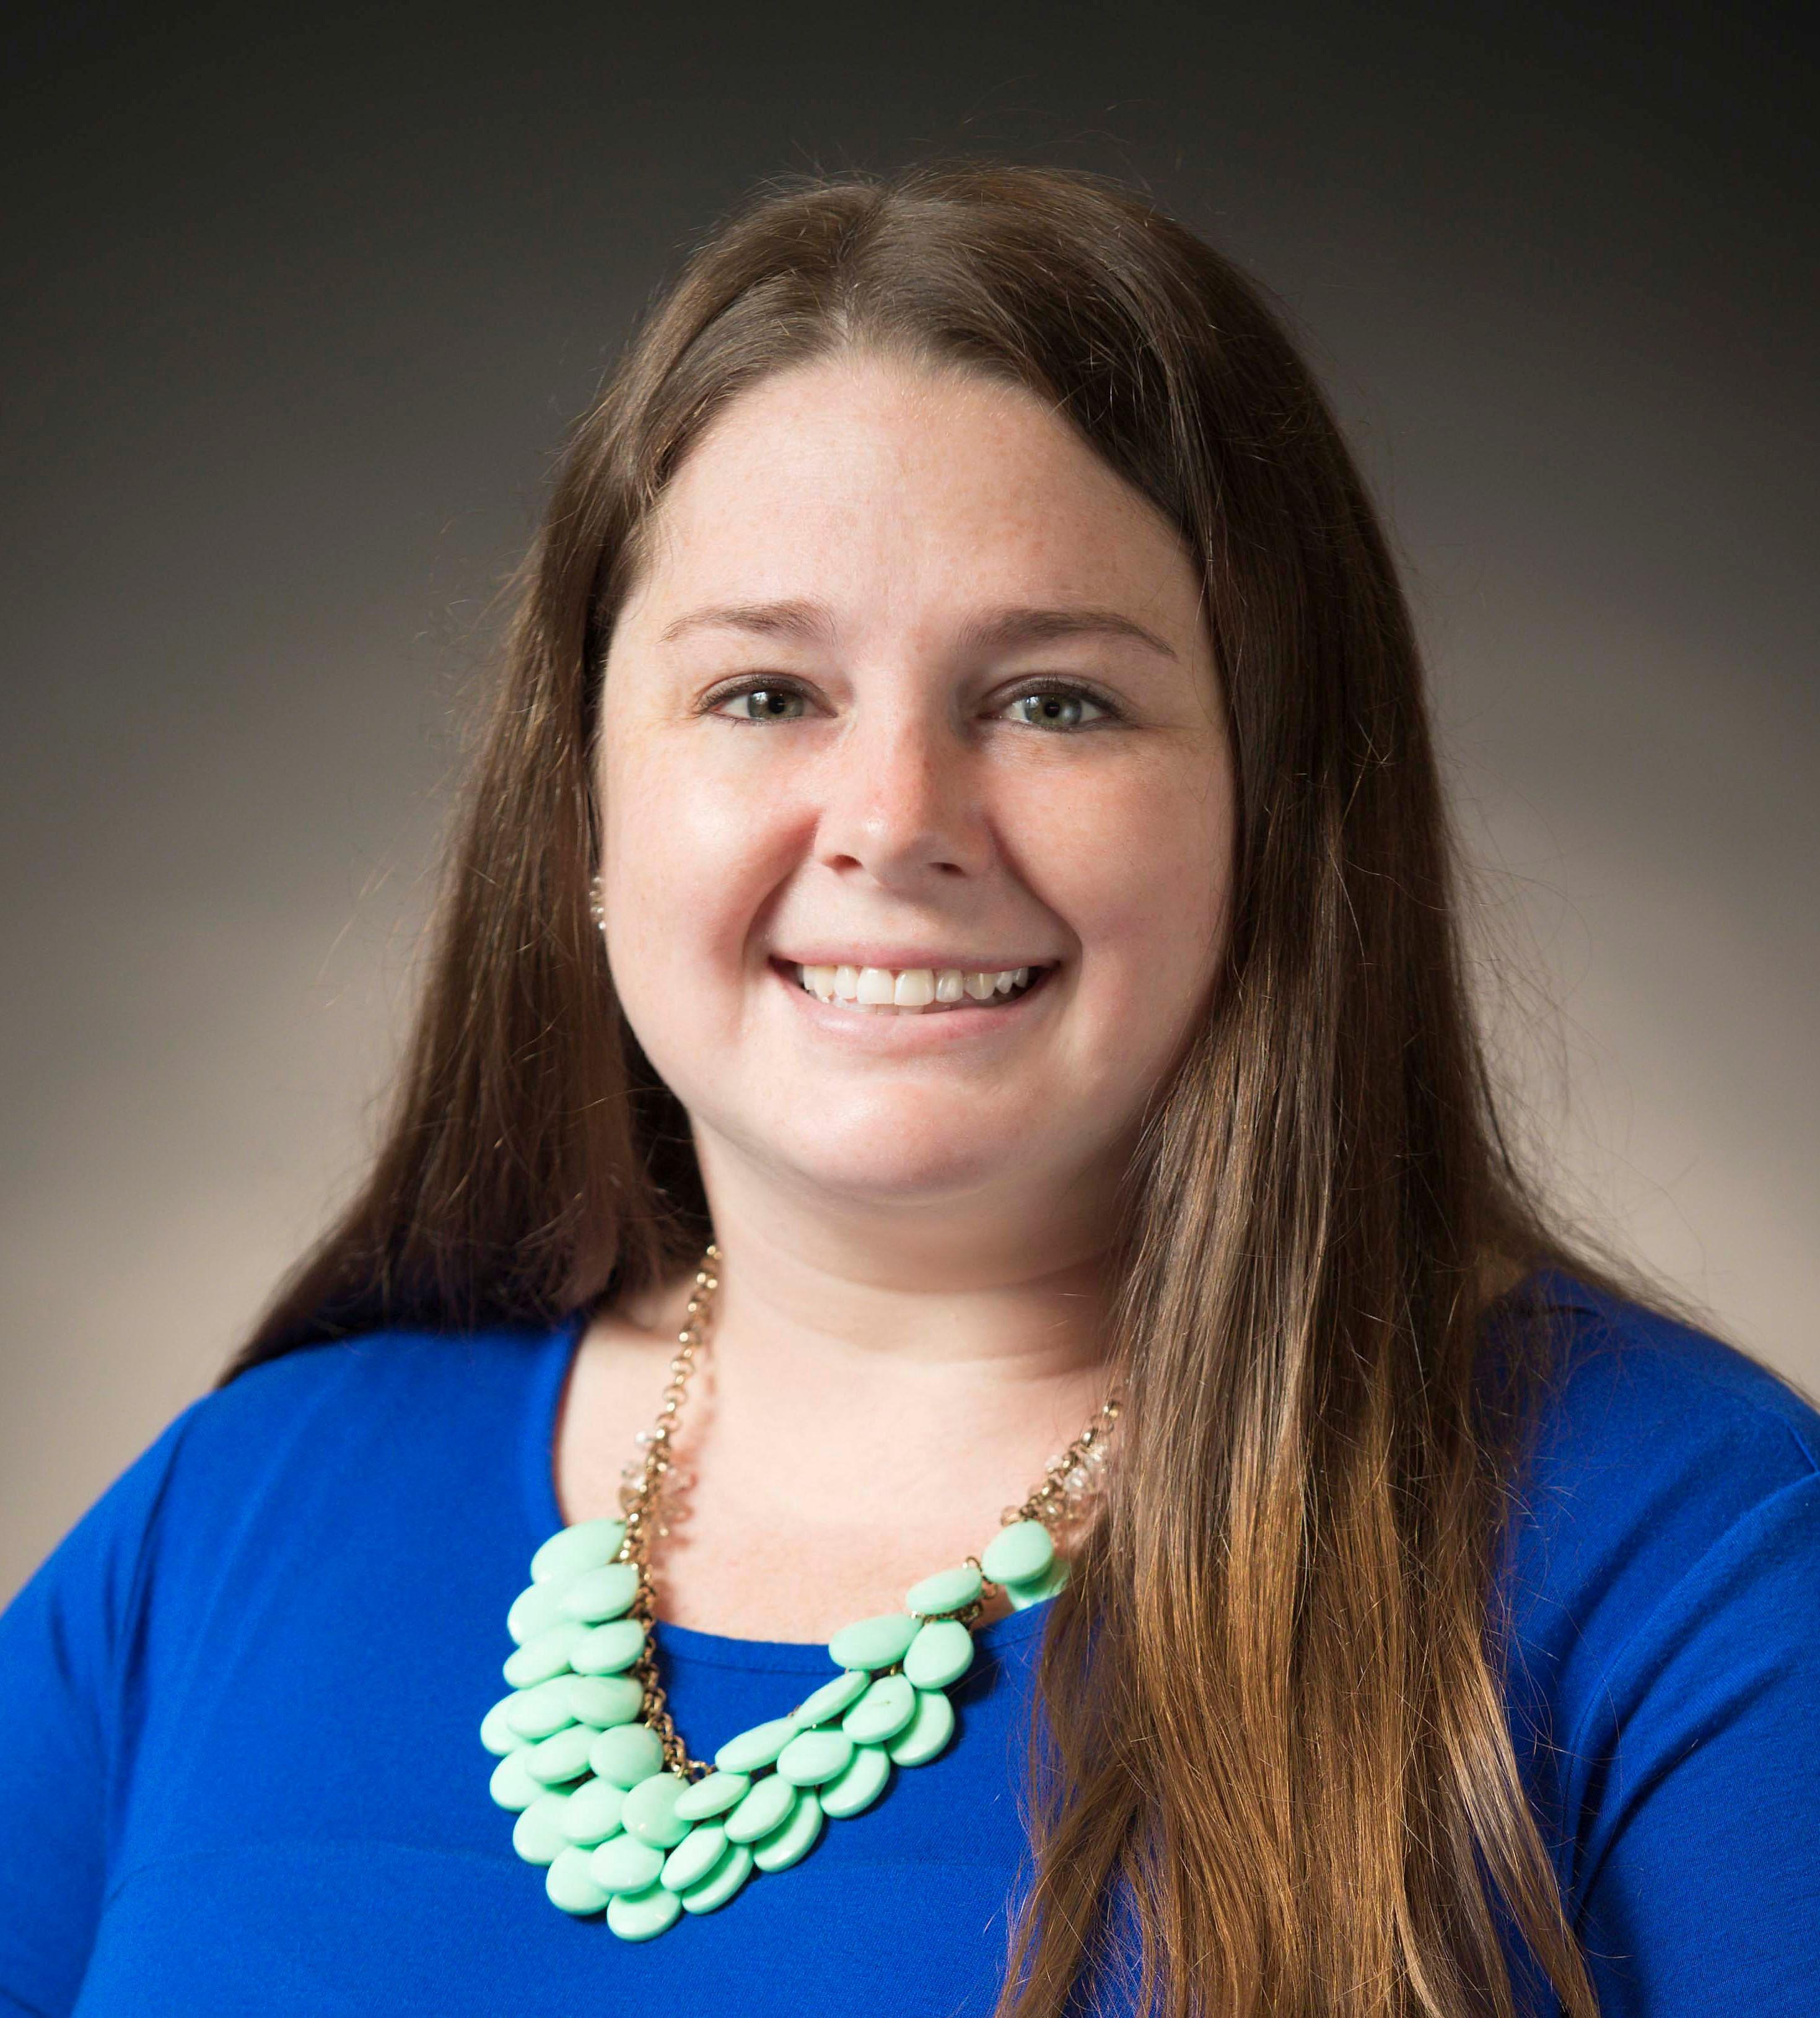 Photo of Kimberly Nettles, Instructional Facilitator